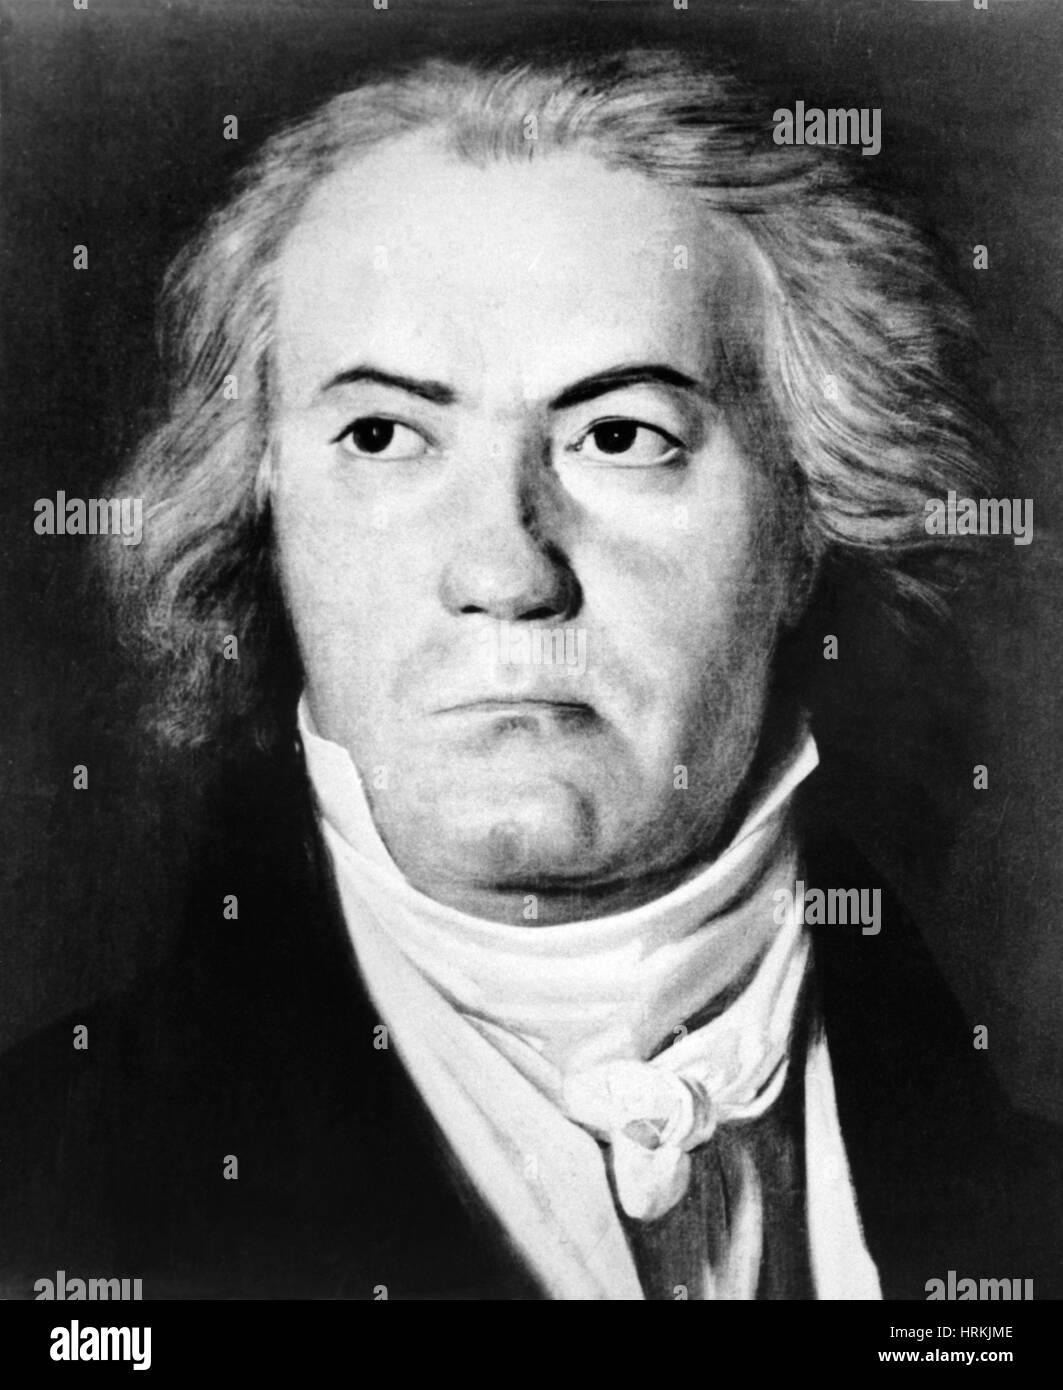 Ludwig van Beethoven, German Composer - Stock Image